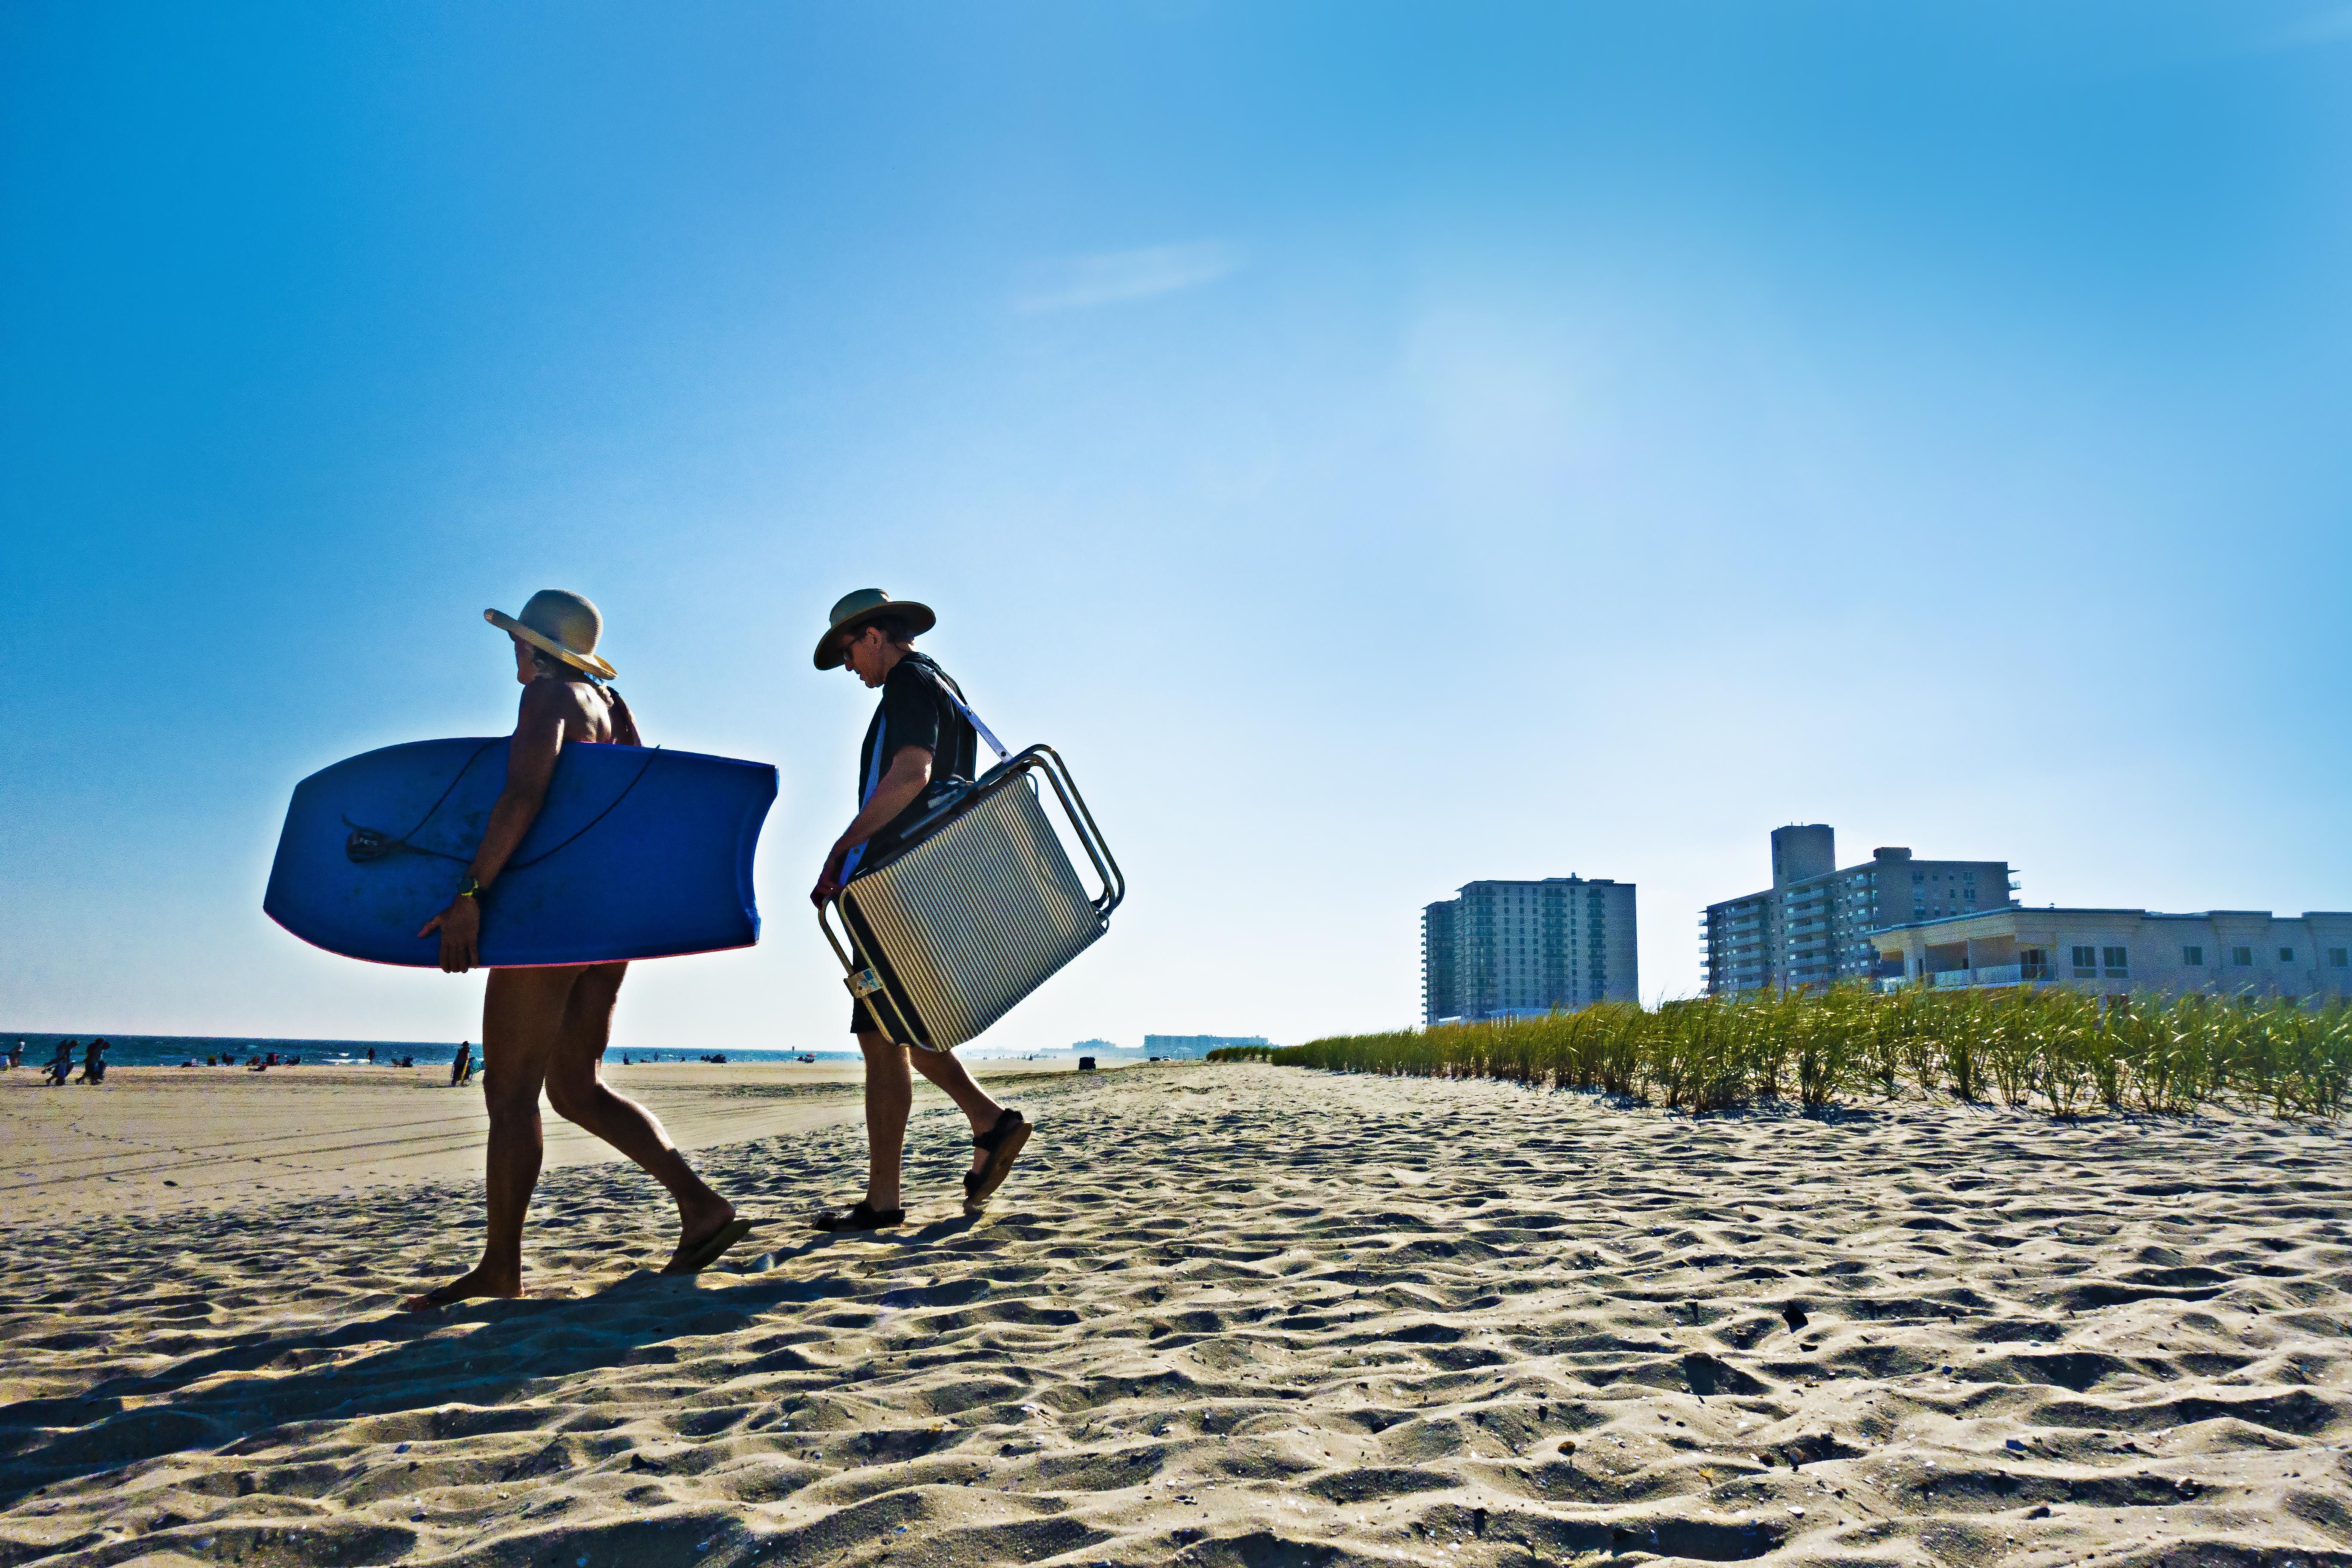 Tony_Ward_Studio_Margate_Beach_New_Jersey_bathers_surfboard_summer_shore